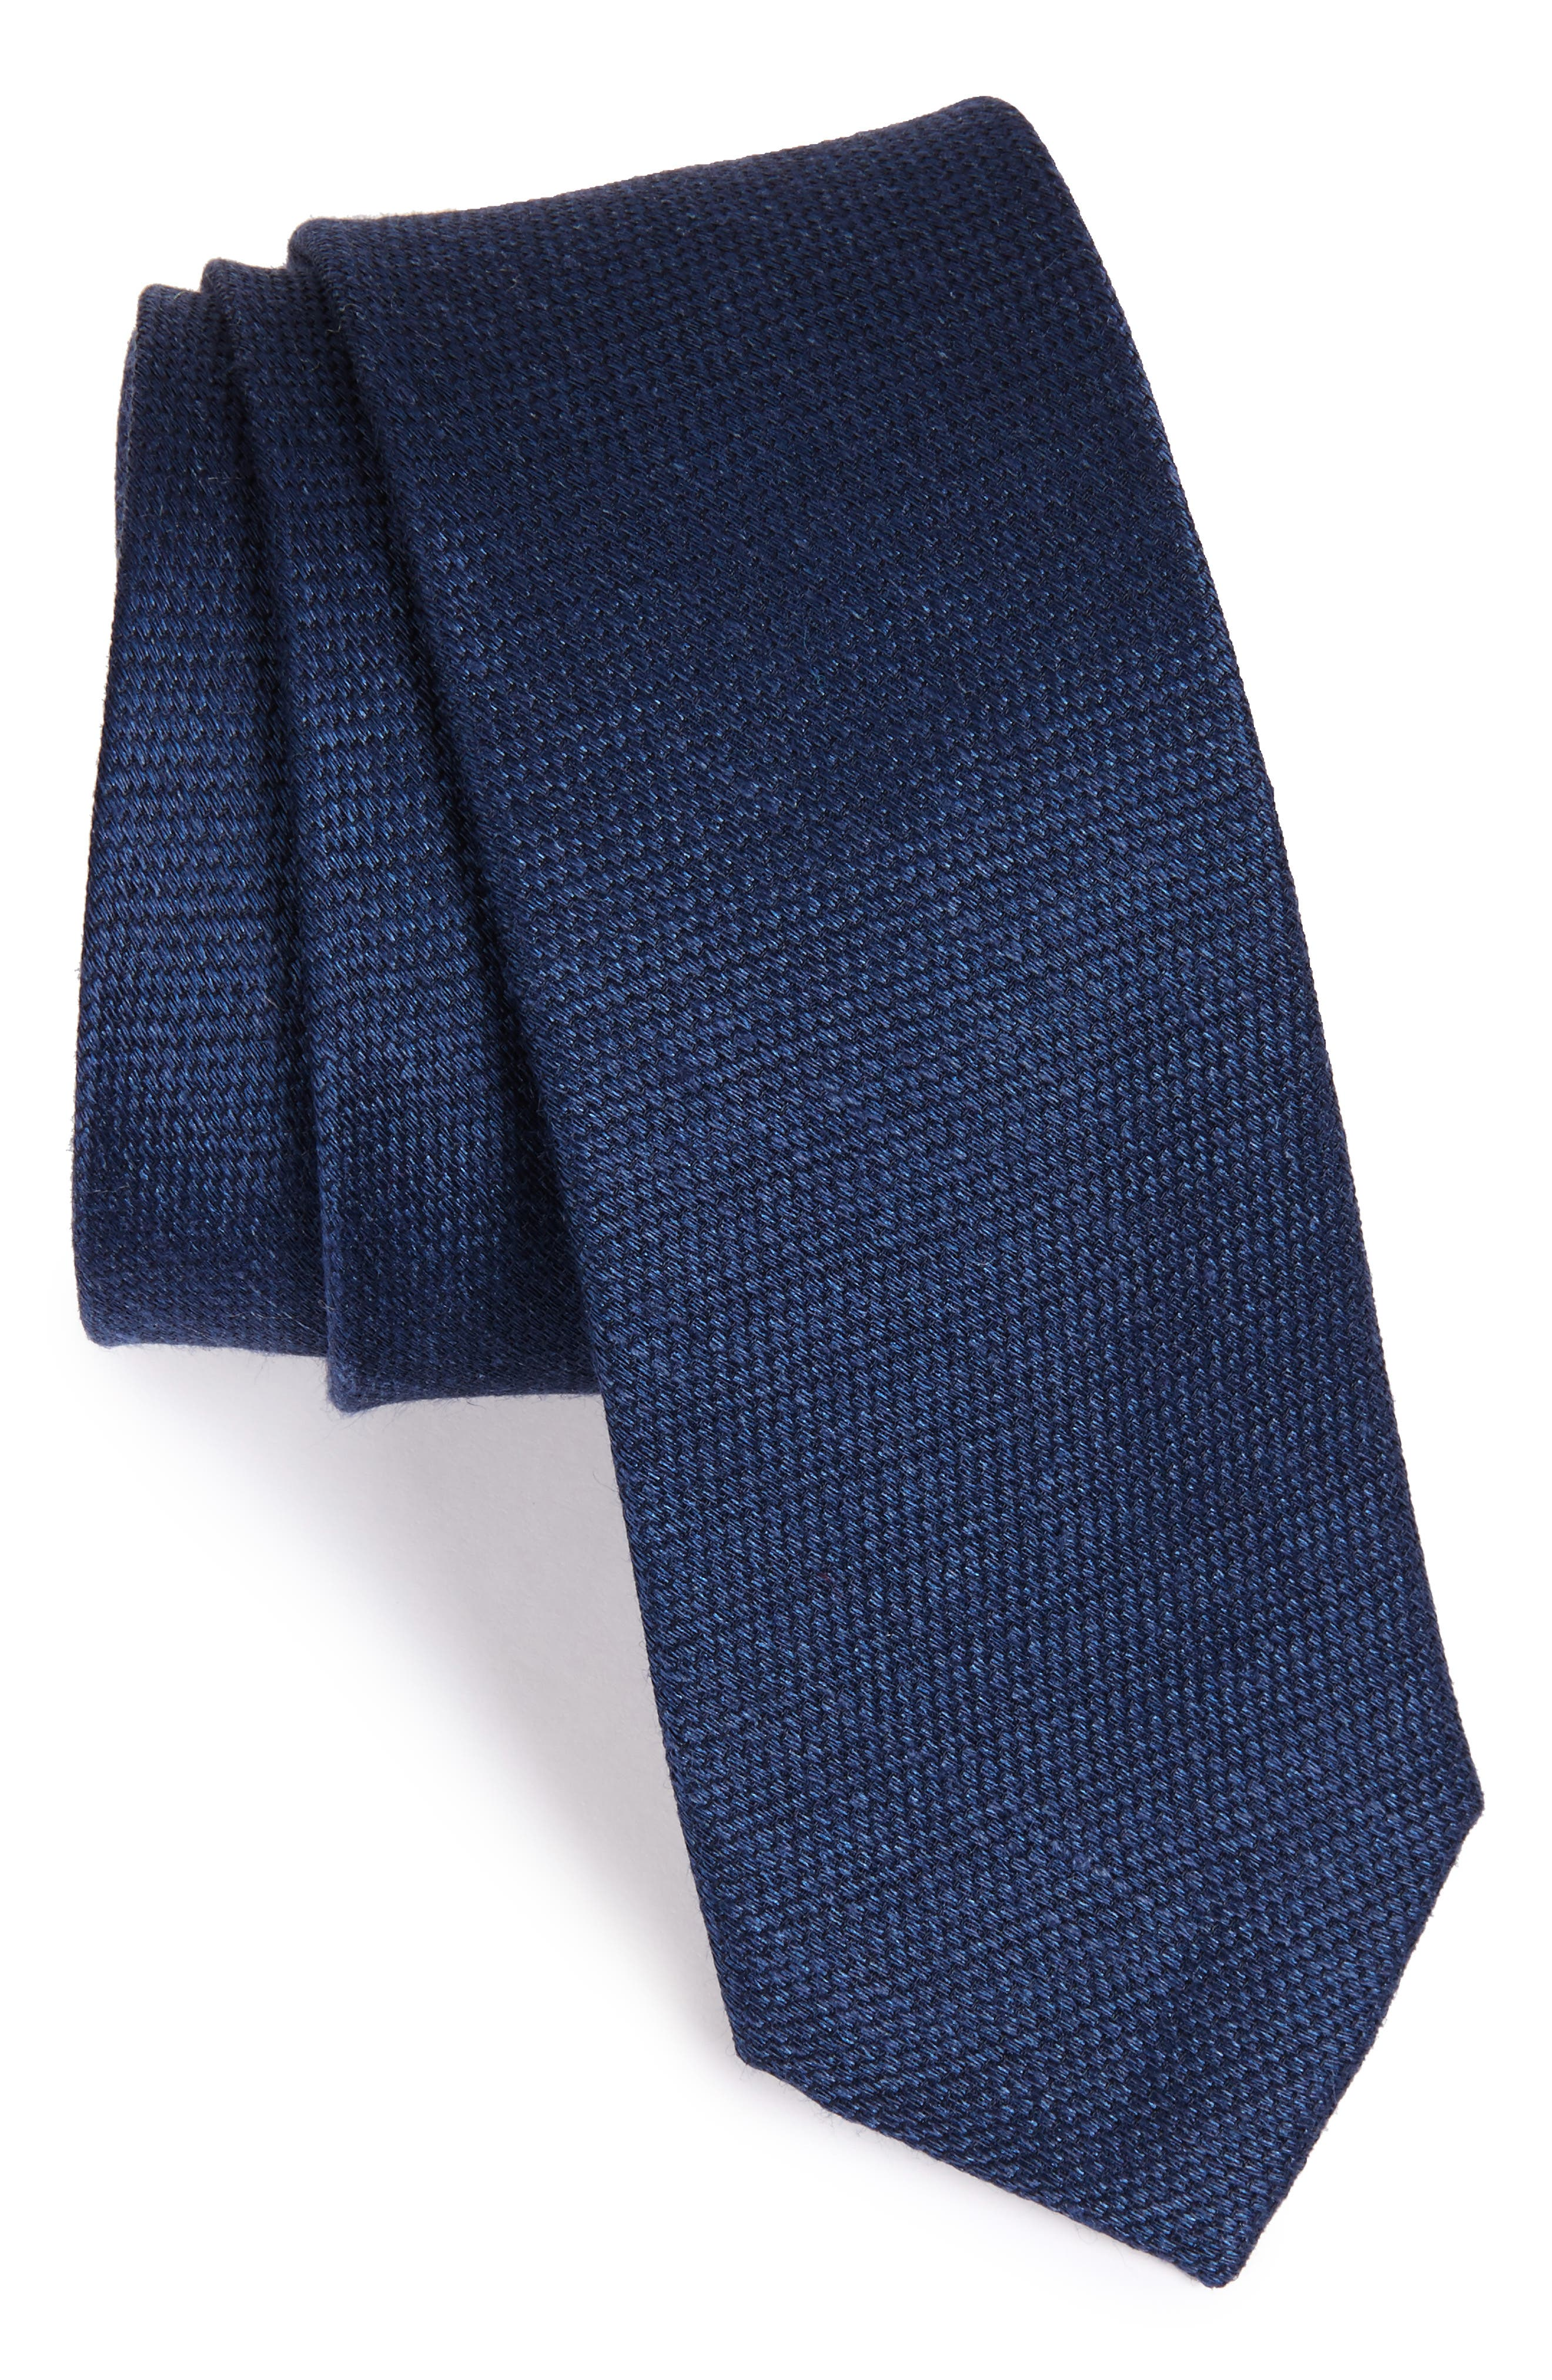 Main Image - The Tie Bar Solid Silk & Linen Tie